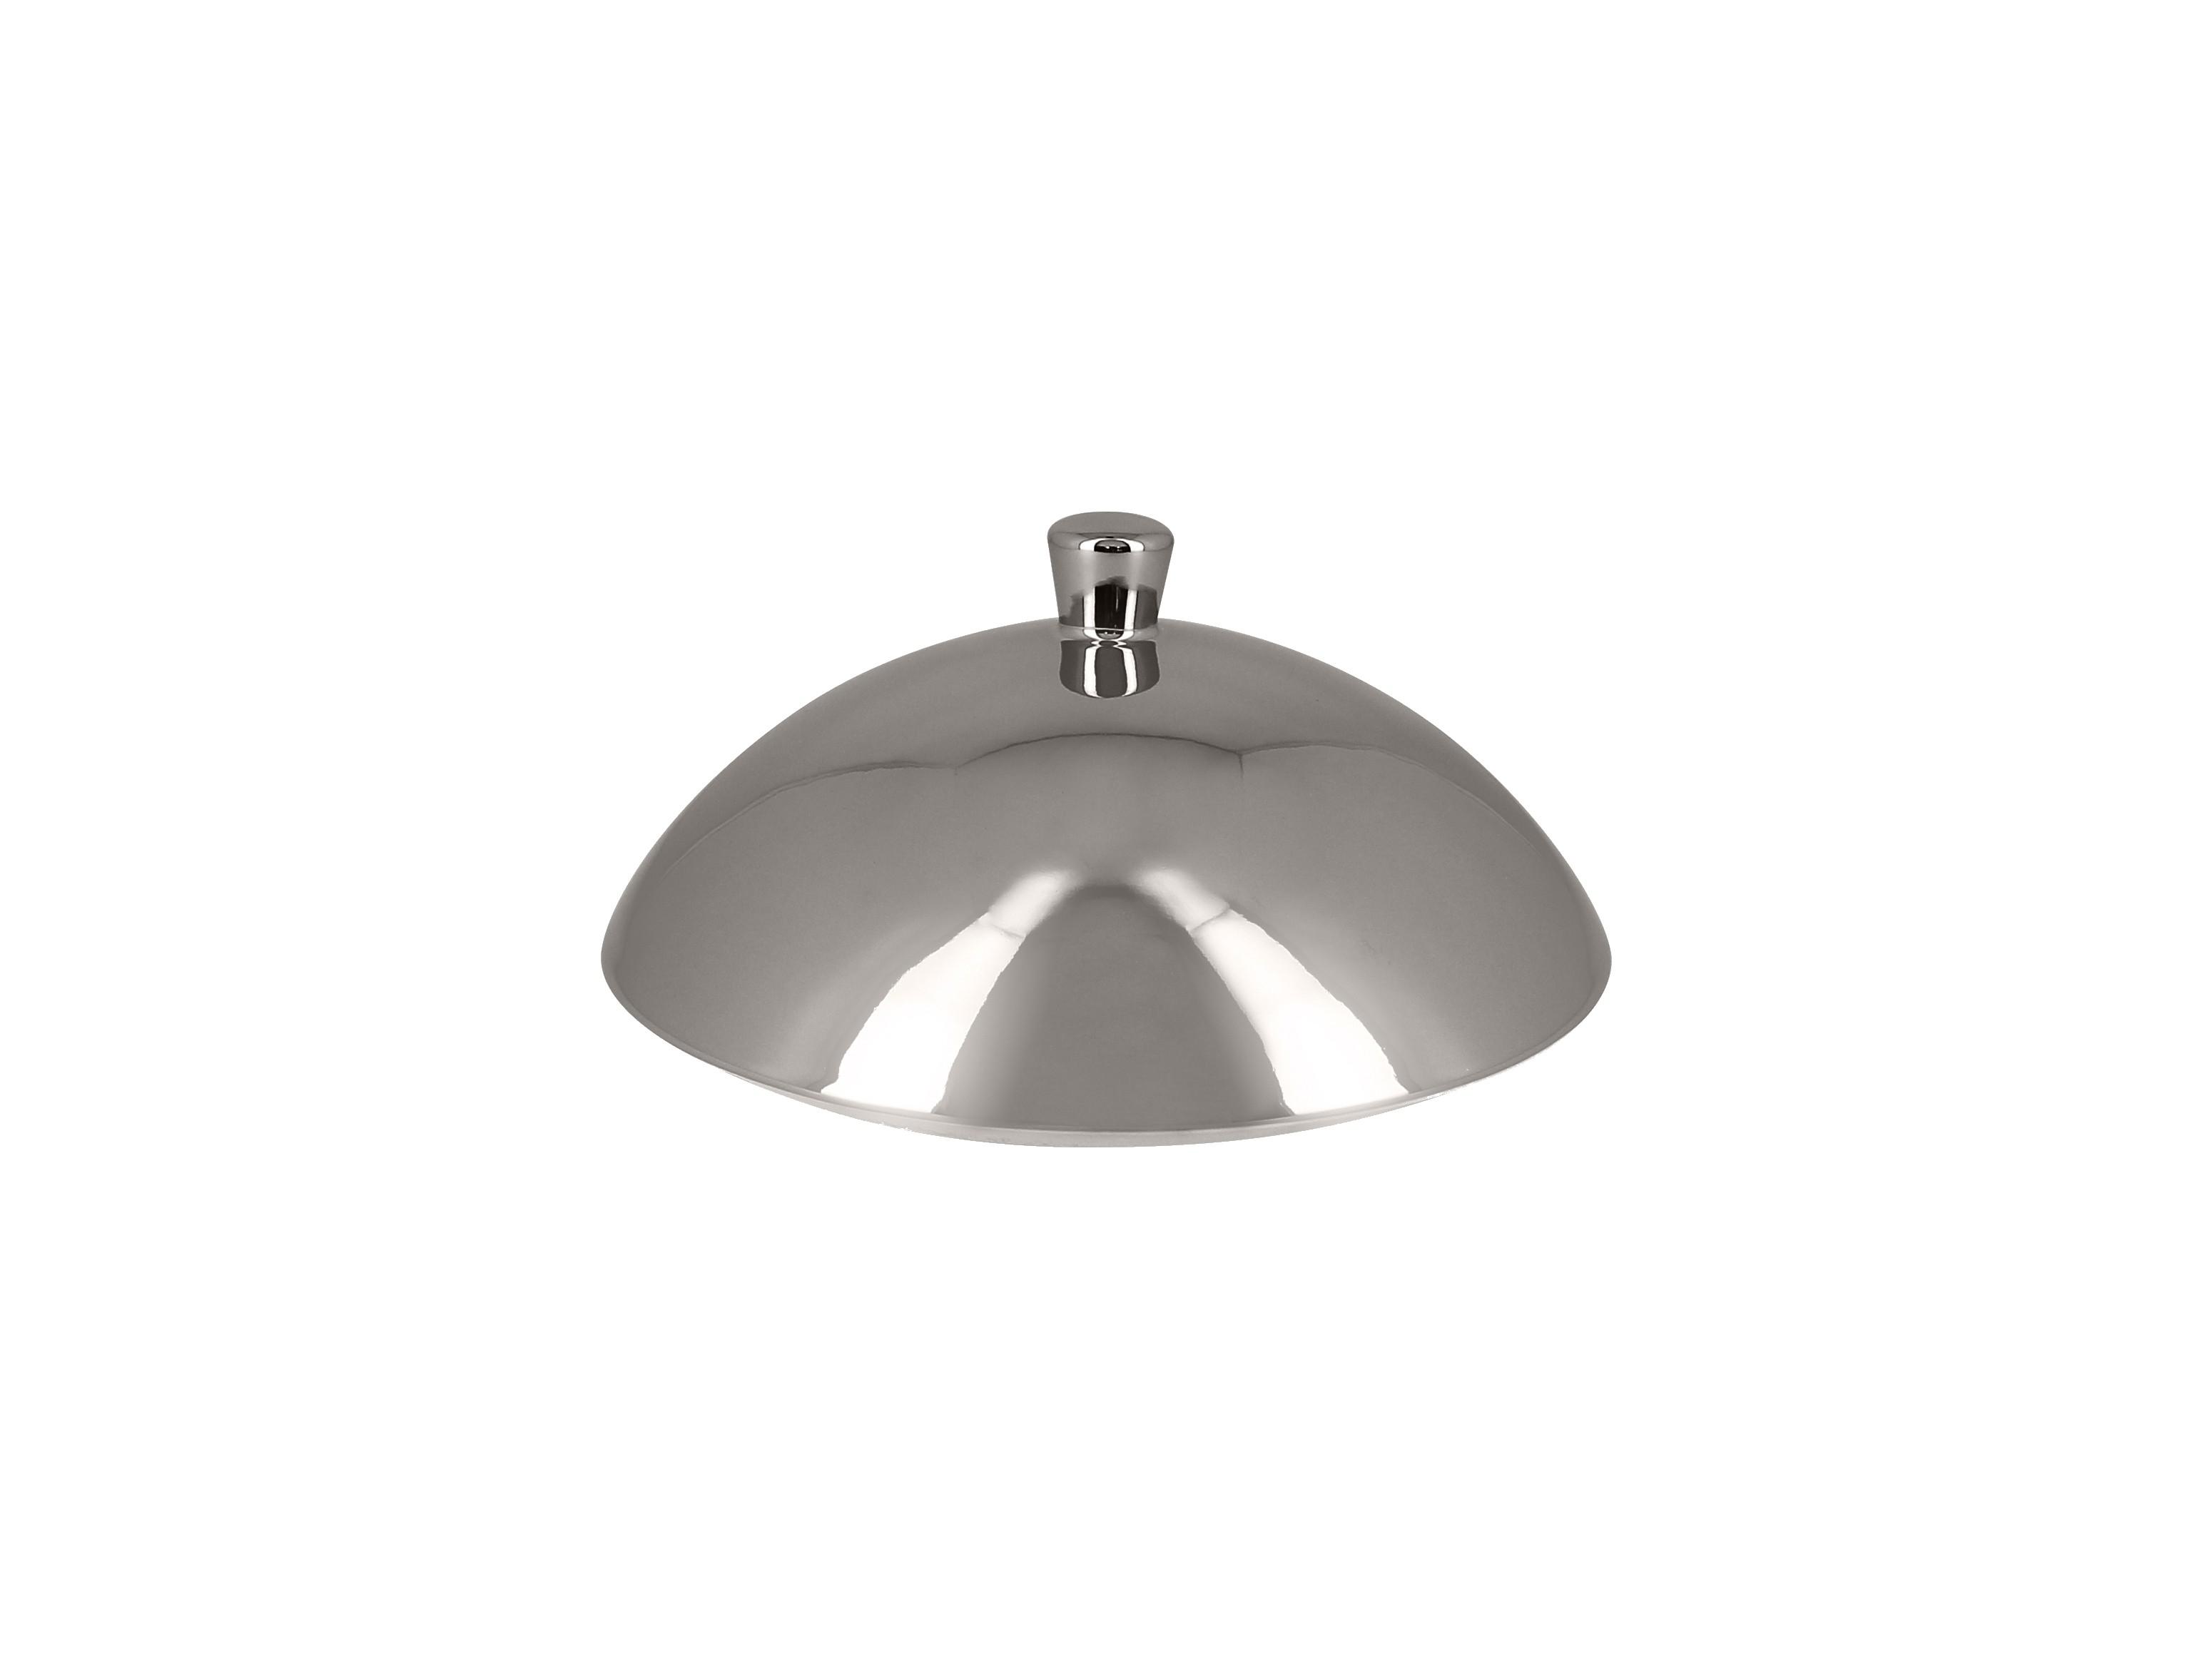 RAK | Metalfusion poklička pro talíř hluboký Gourmet pr. 15,5 cm, stříbrný